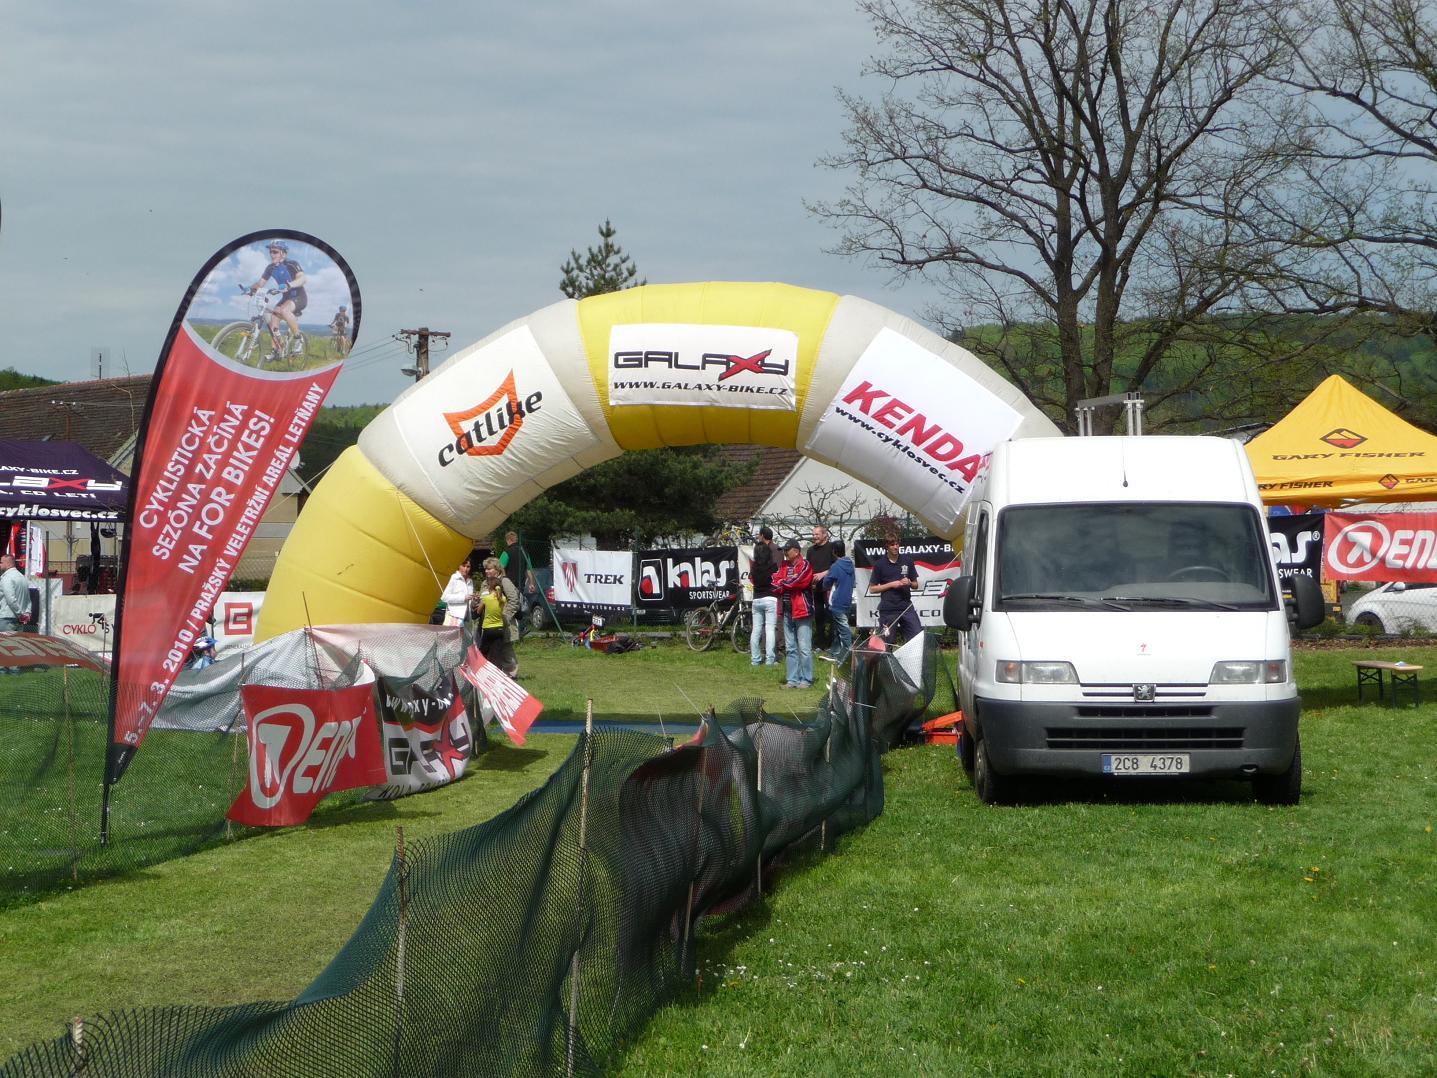 Galaxy CykloŠvec maraton Tálín 2010